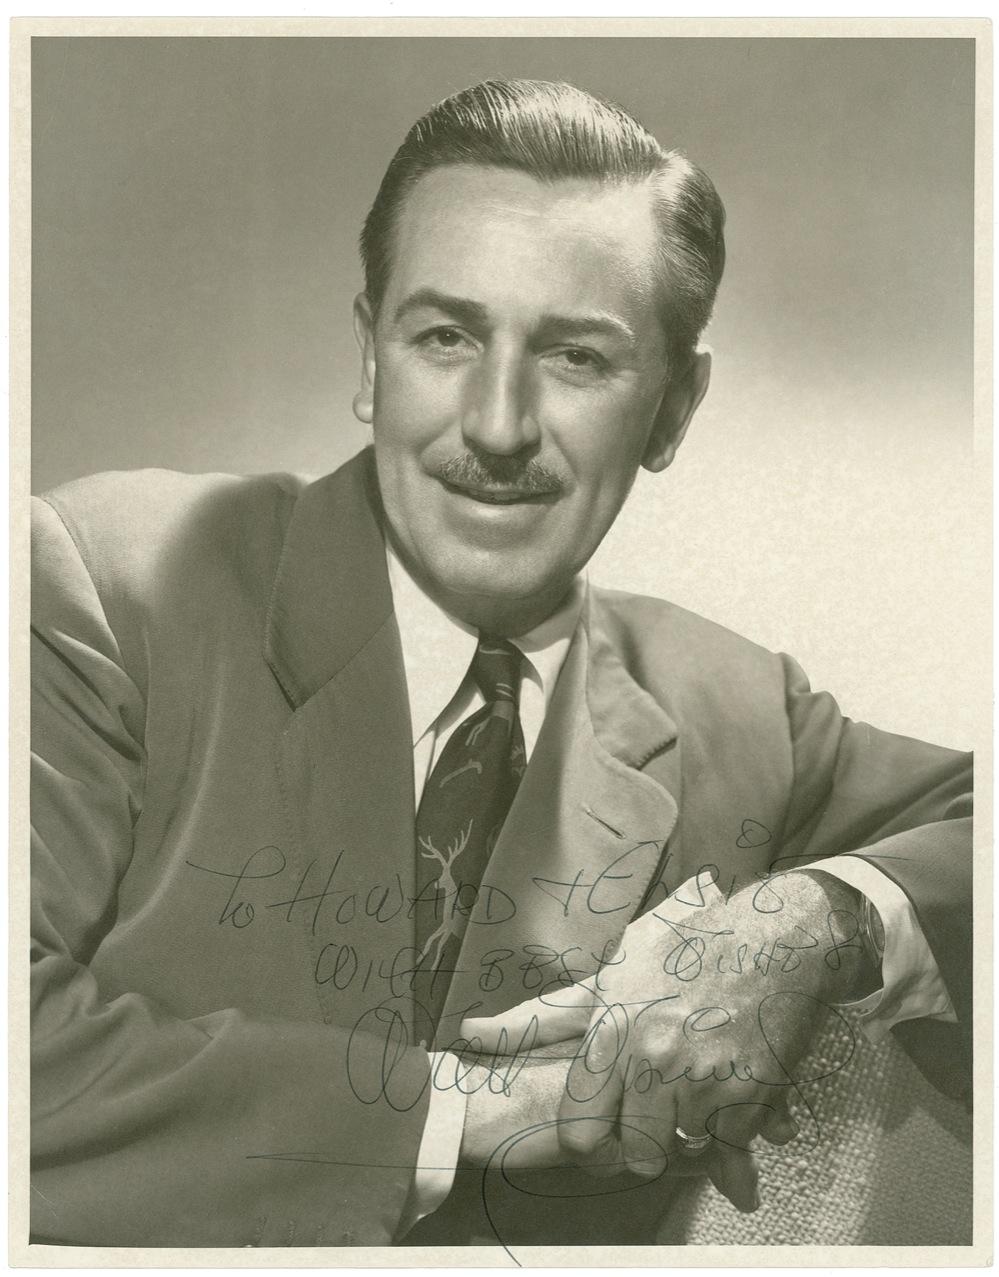 Walt Disney Autograph Walt Disney Signed & Inscribed Photo -- Rare Large Format Photo With Bold Disney Signature